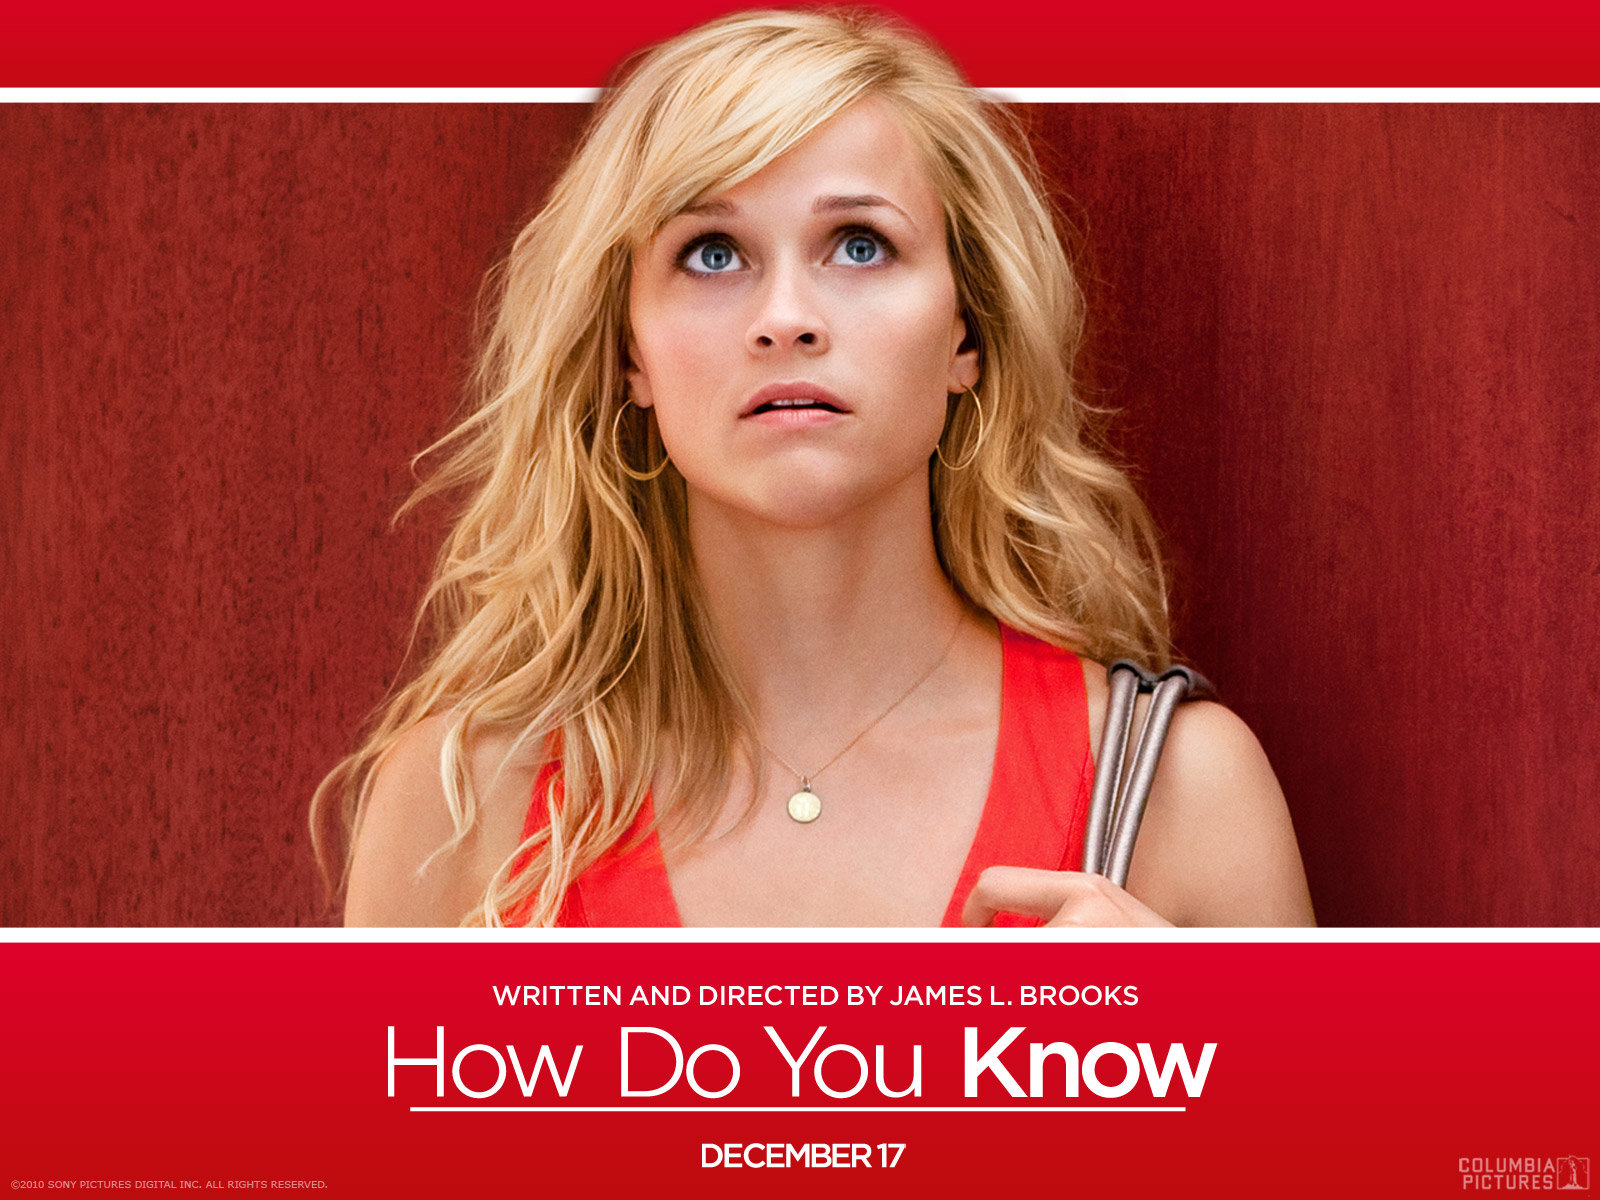 How Do You Know Wallpaper   10024190 1280x1024 Desktop Download 1600x1200